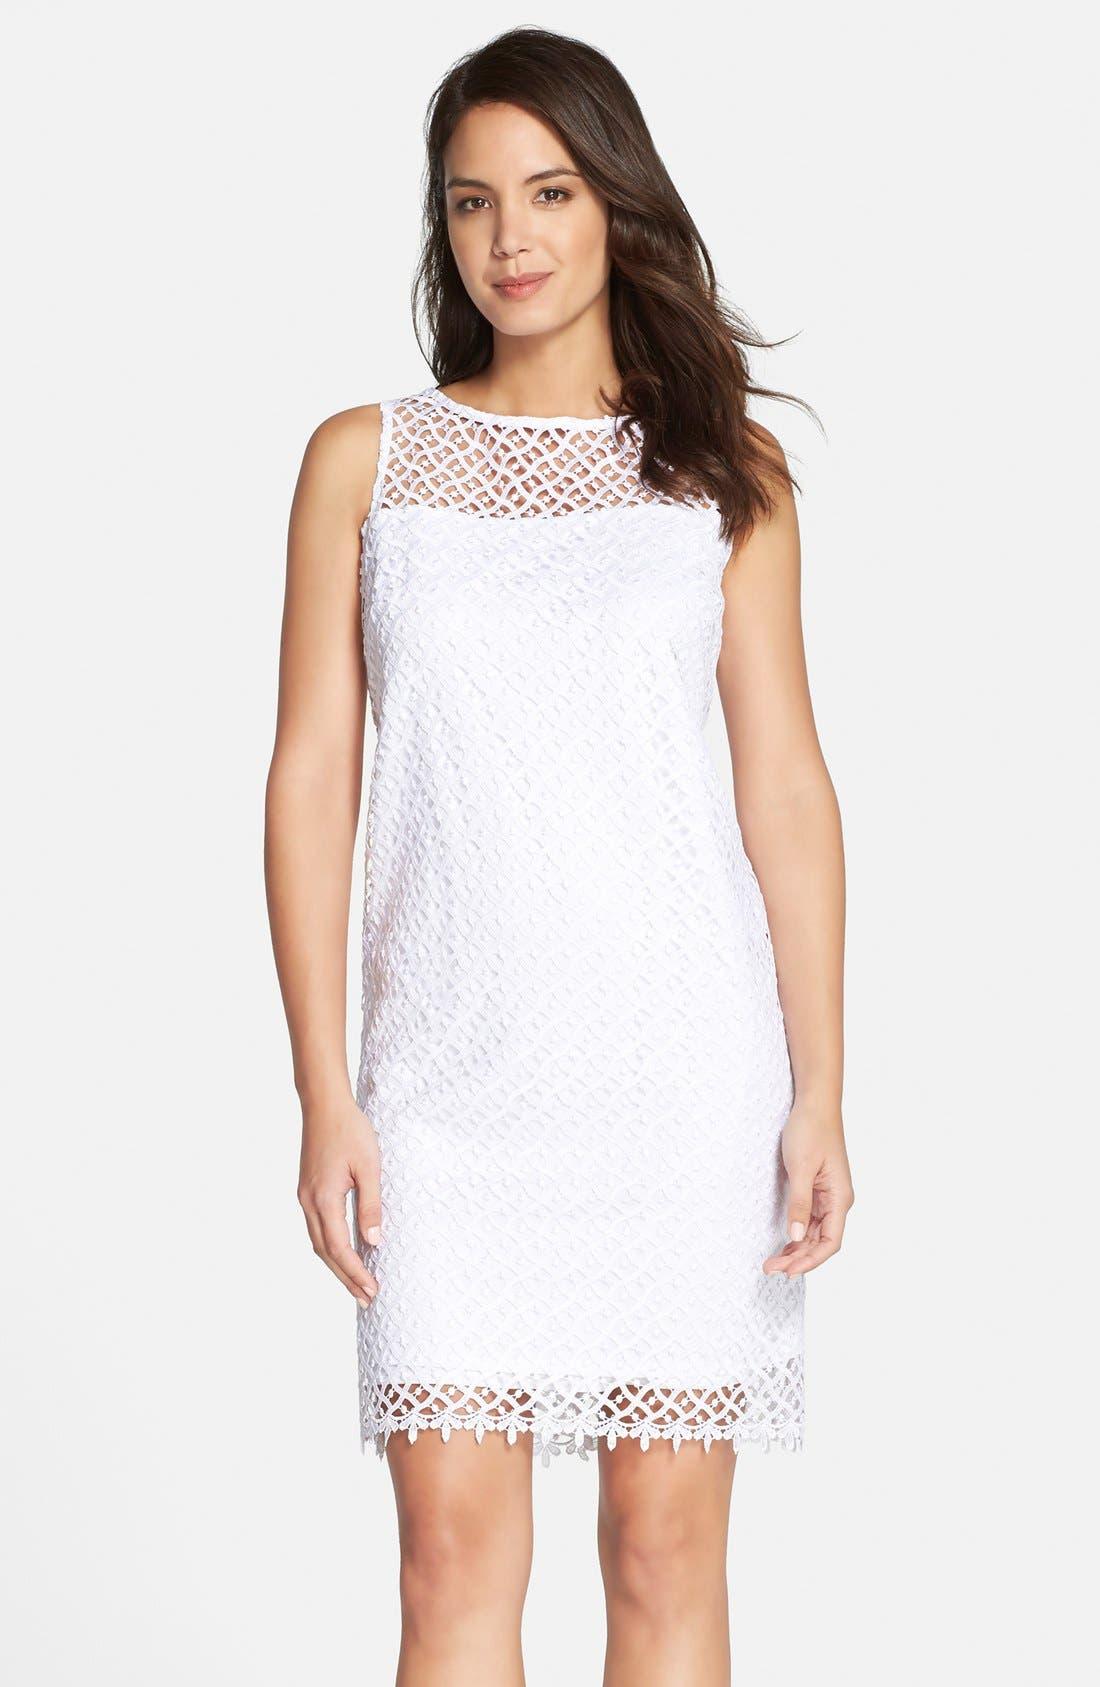 Alternate Image 1 Selected - Marina Illusion Yoke Lace Shift Dress